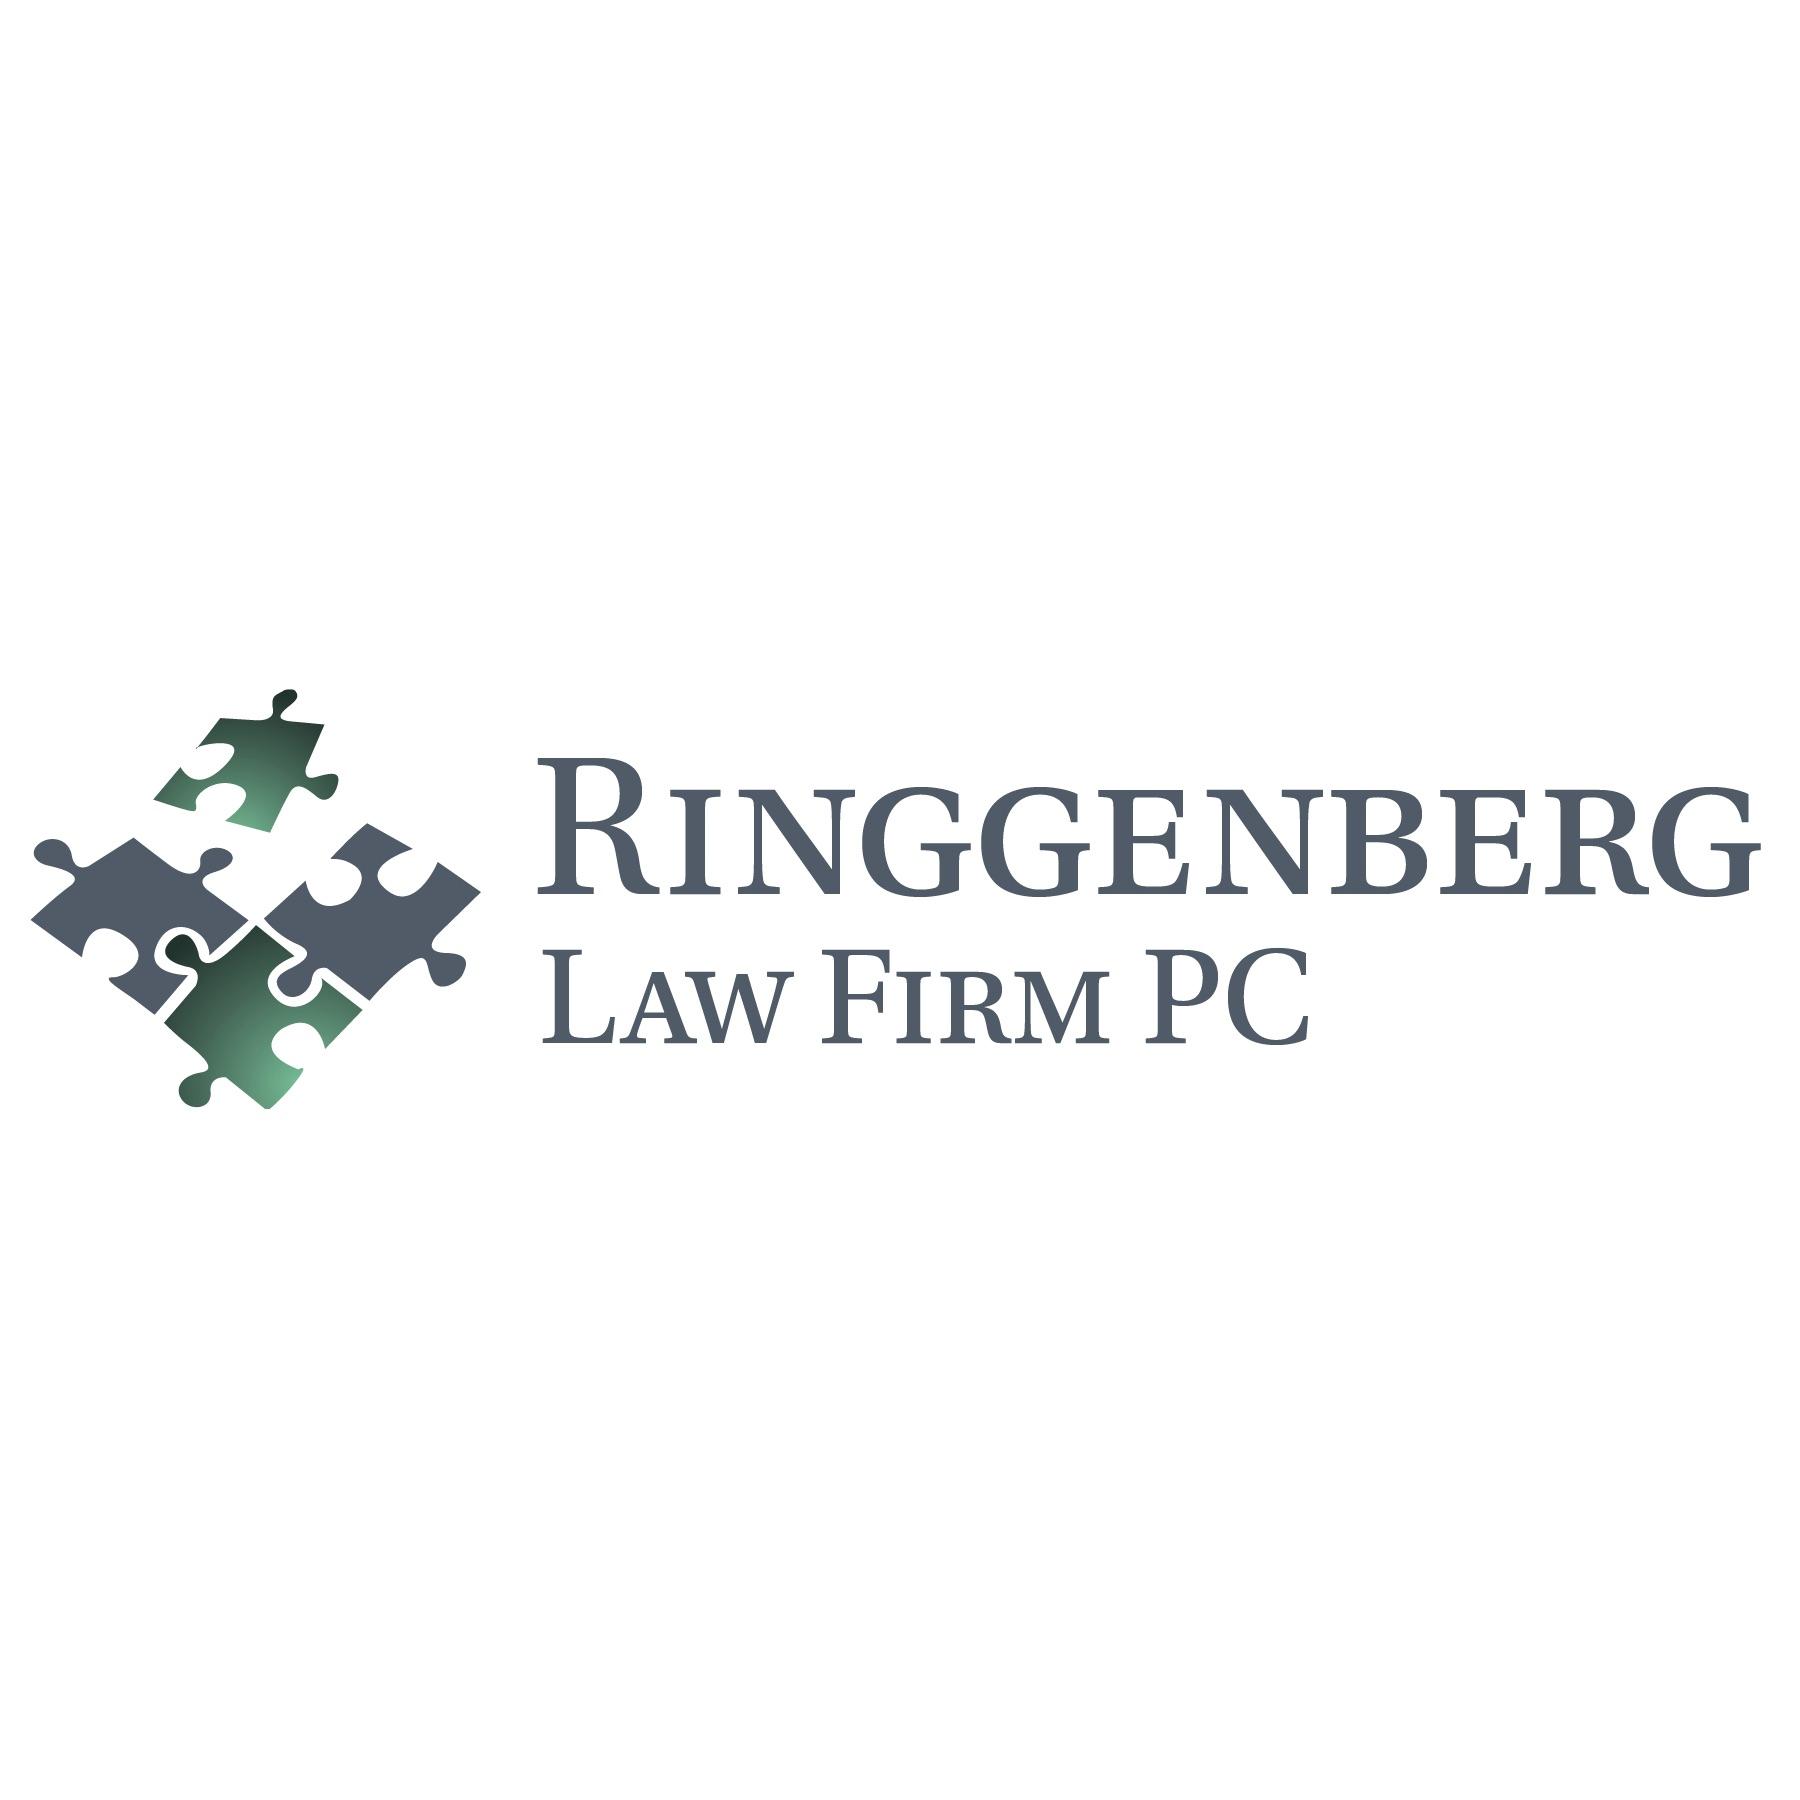 Logo for Ringgenberg Law Firm PC